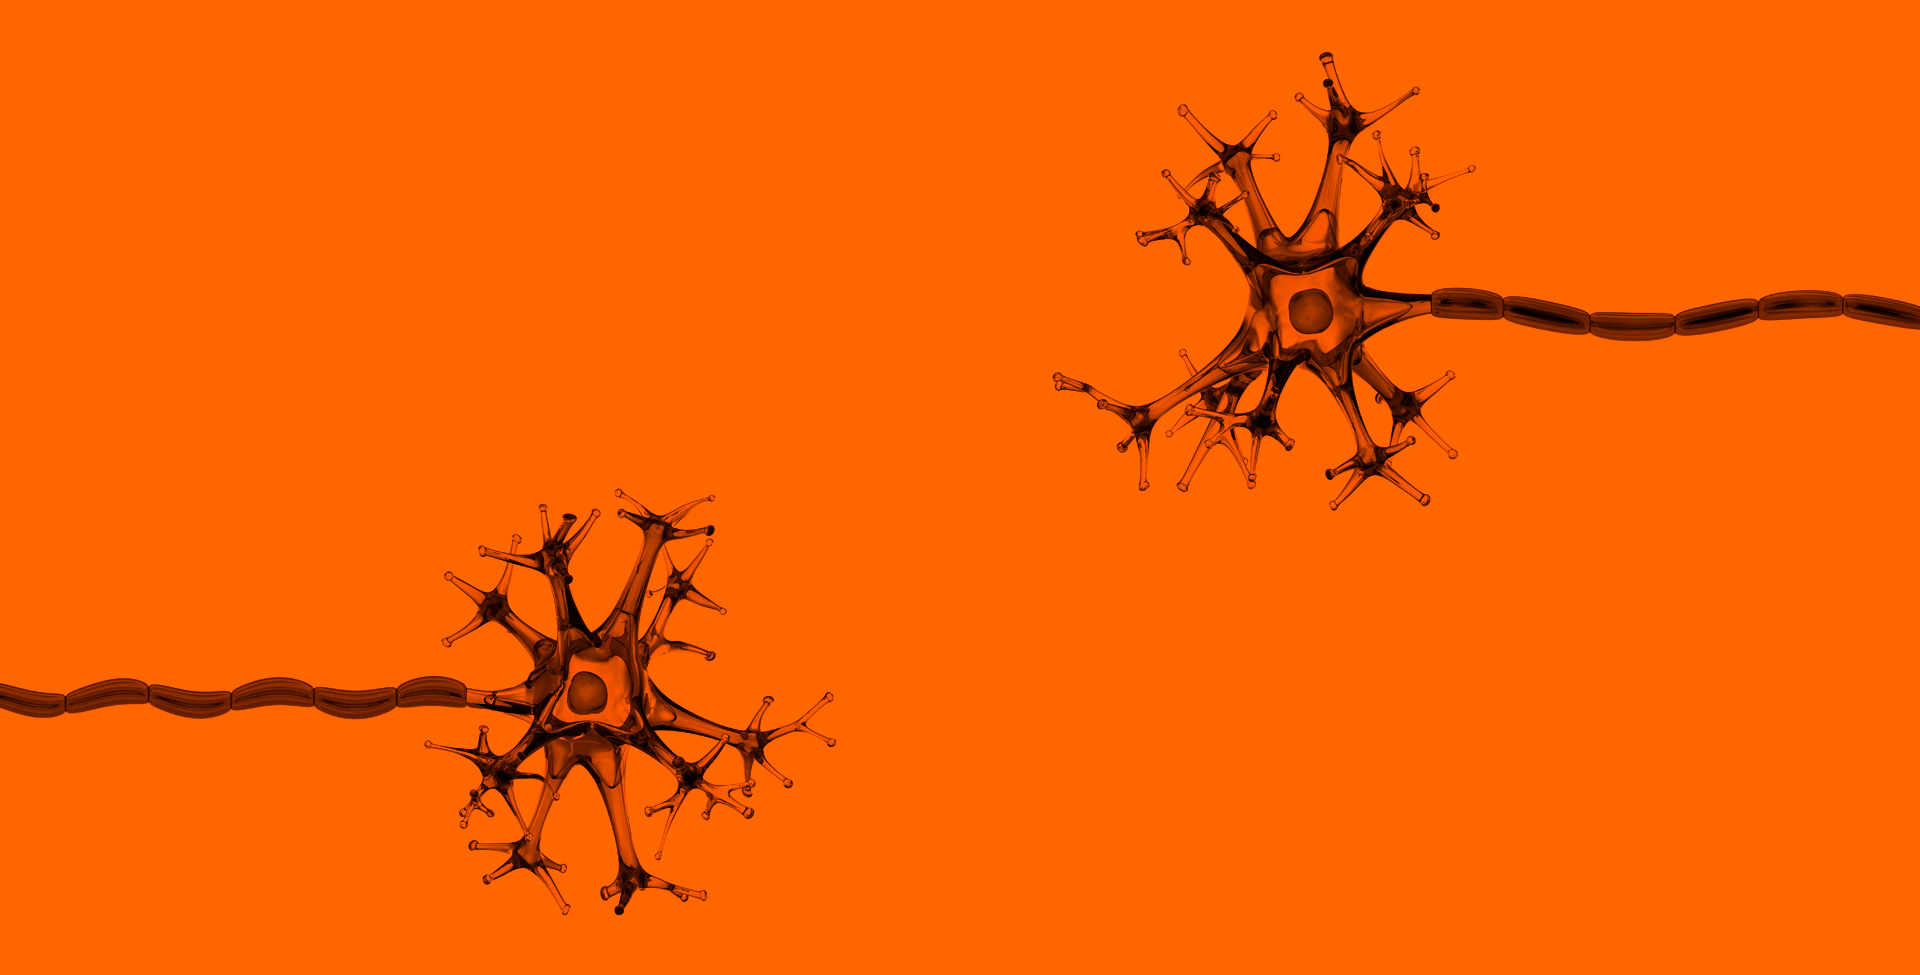 Neurociência e os impactos das Metodologias Ativas no cérebro dos estudantes